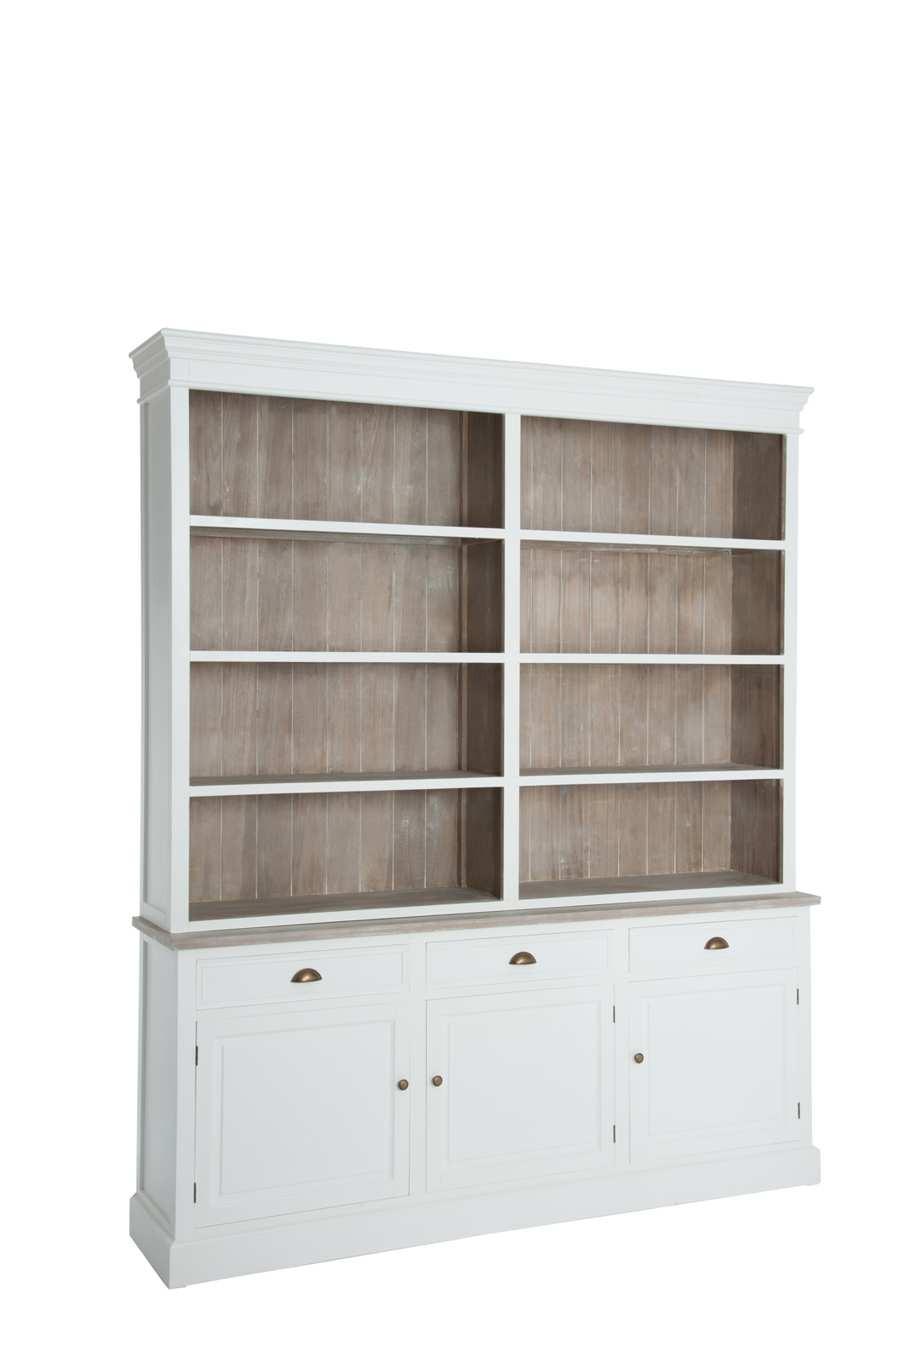 biblioth que classique with meuble tv classique chic